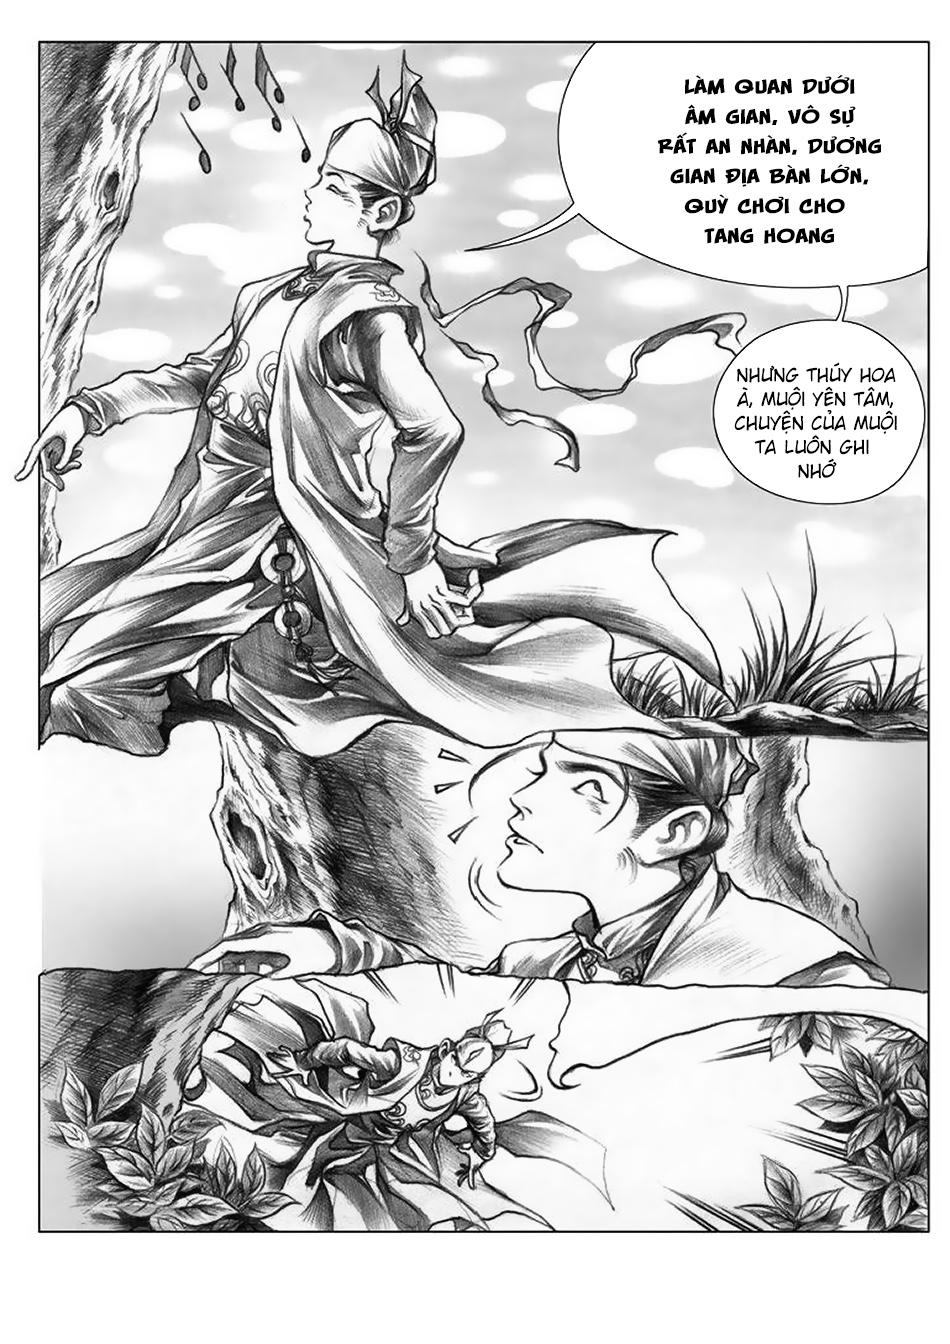 Chung Quỳ Truyền Kỳ Chapter 2 - Hamtruyen.vn